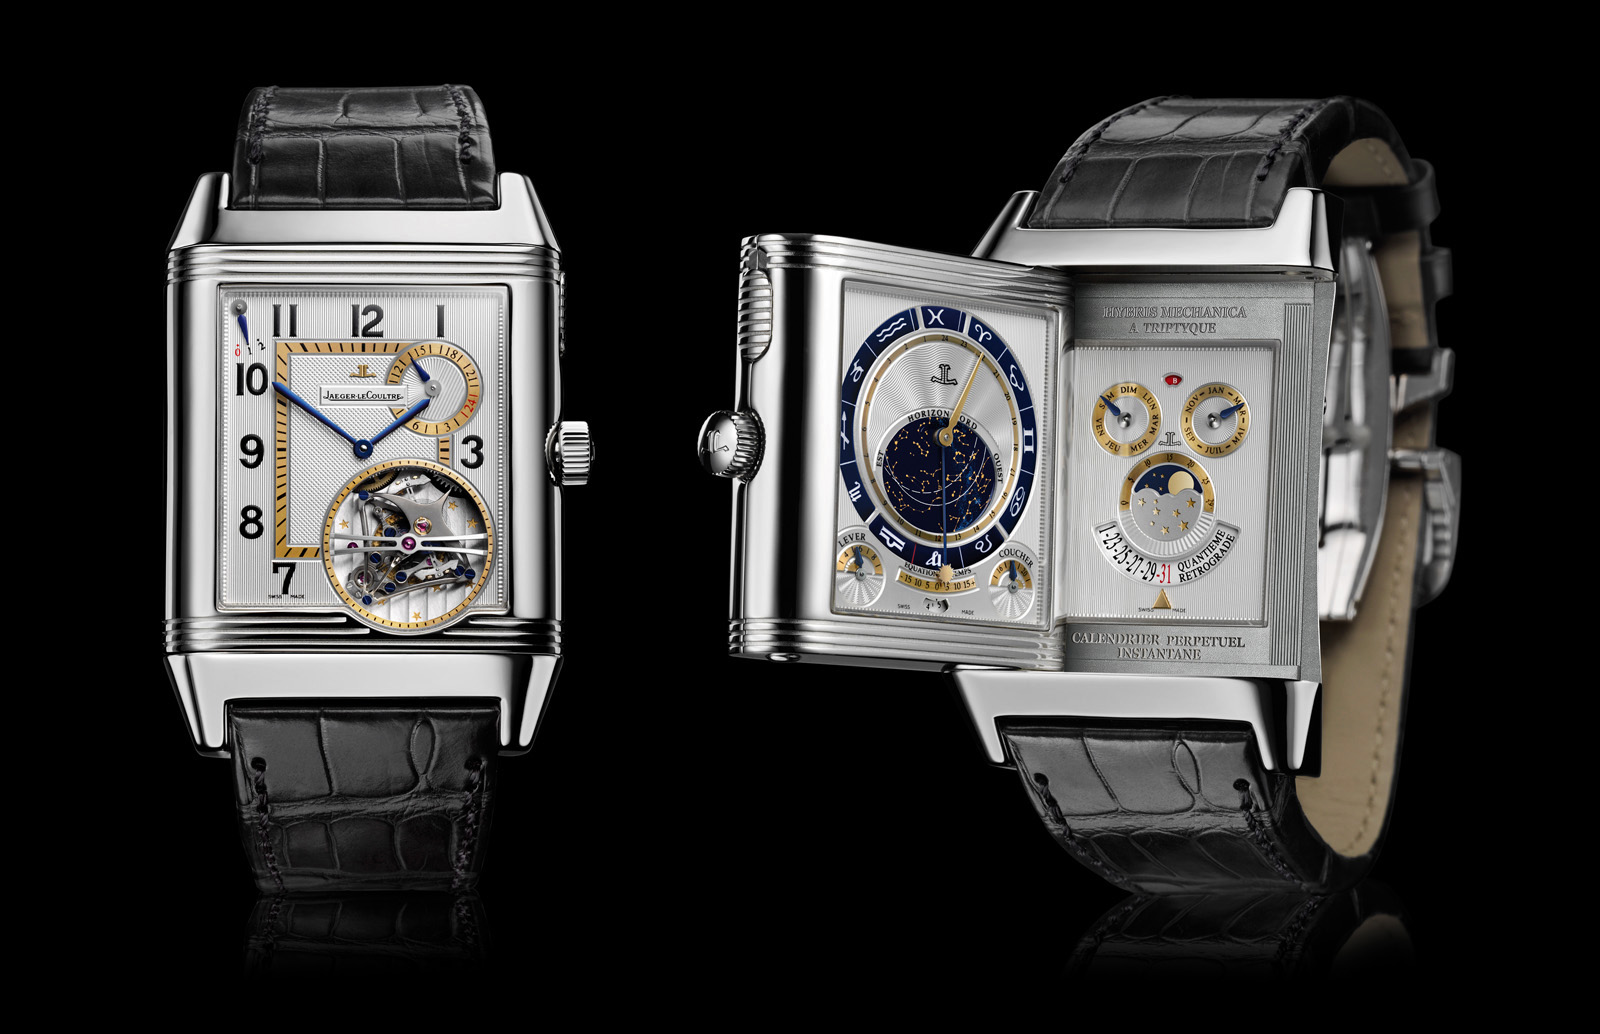 Watchmaker, Reis-Nichols Inc